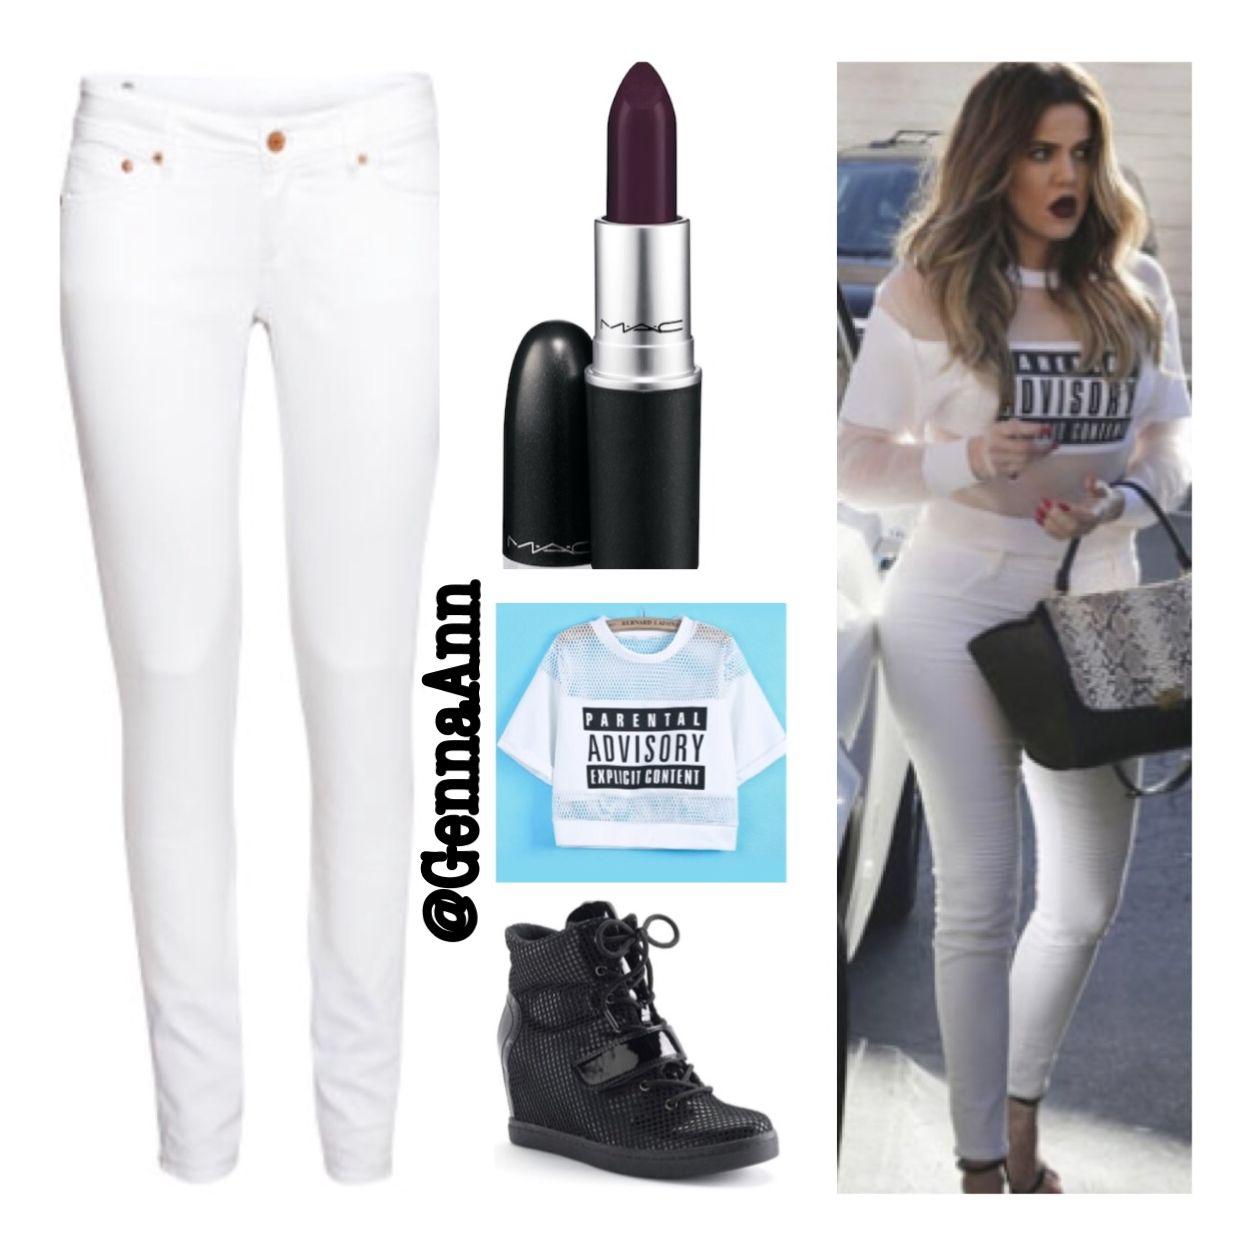 #kardashian #getthelook #dressforless H&M white skinny jeans $20 - mac deep win lipstick $14 - parent advisory crop top #ebay or #asos -kohls wedge sneakers!!!